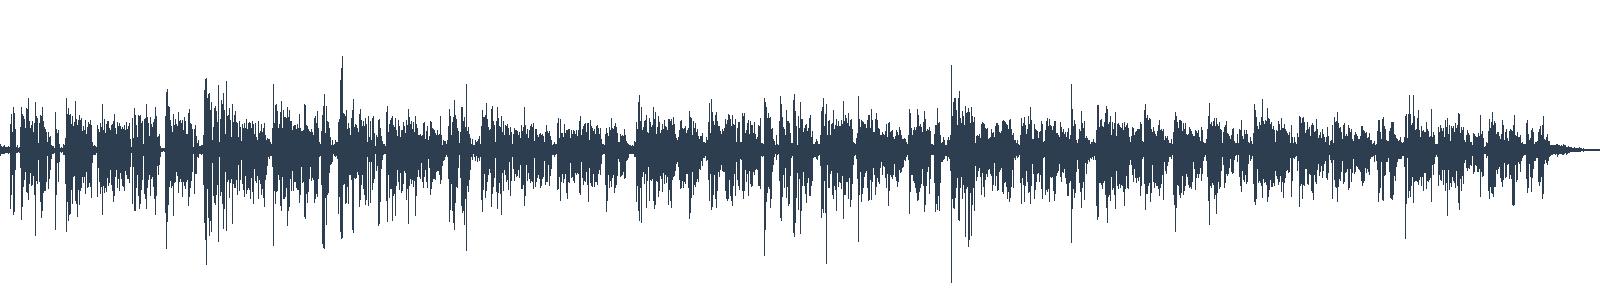 Nové audioknihy 9/2019 waveform